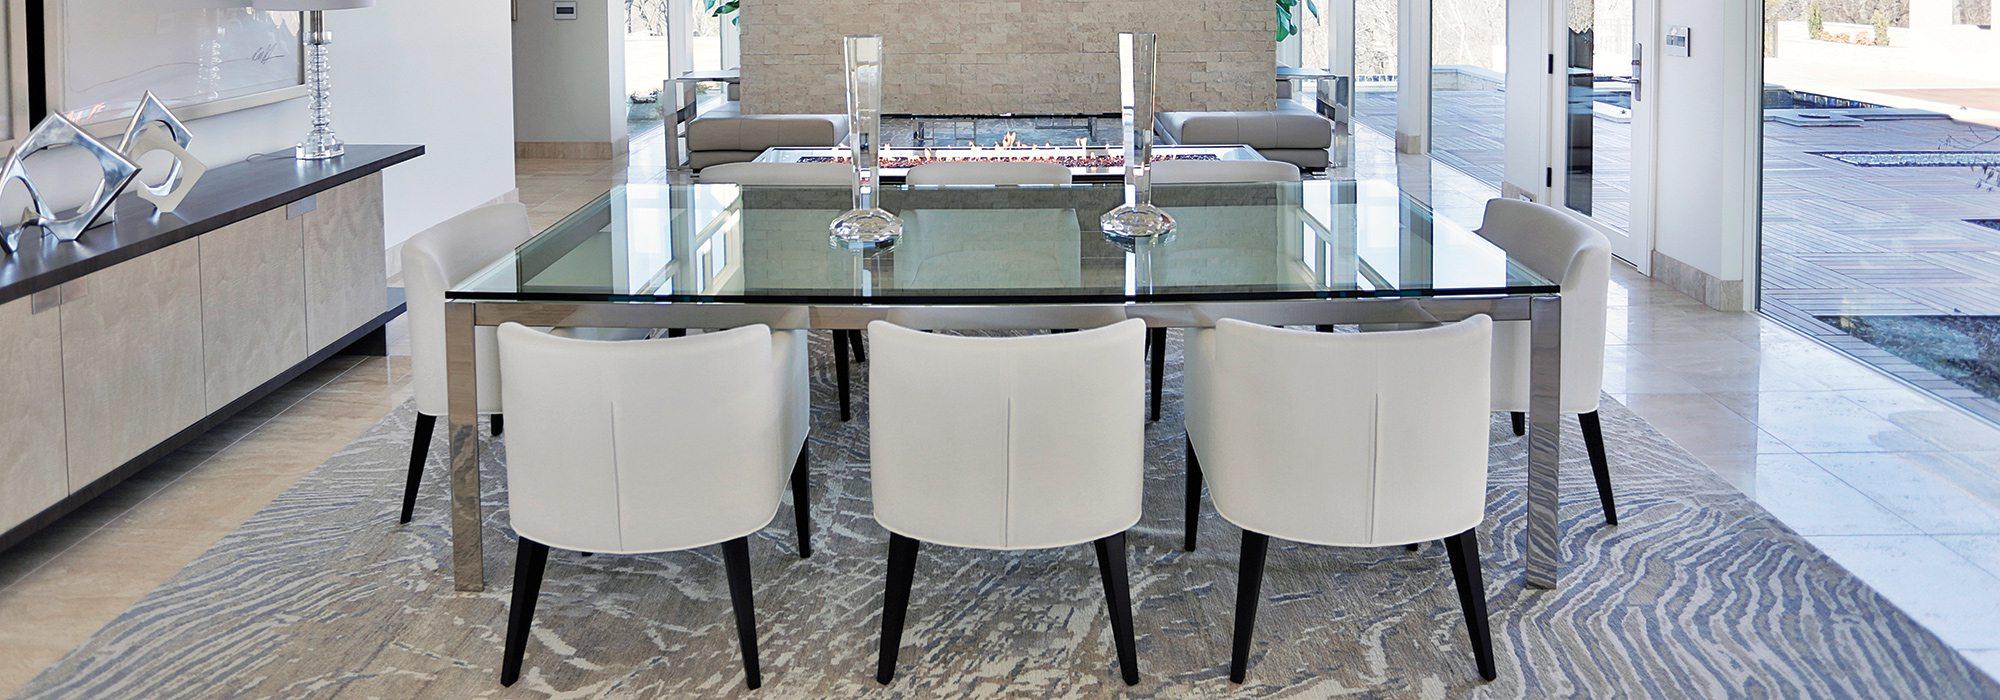 417 Home Design Awards 2015 - Dining Room Winner